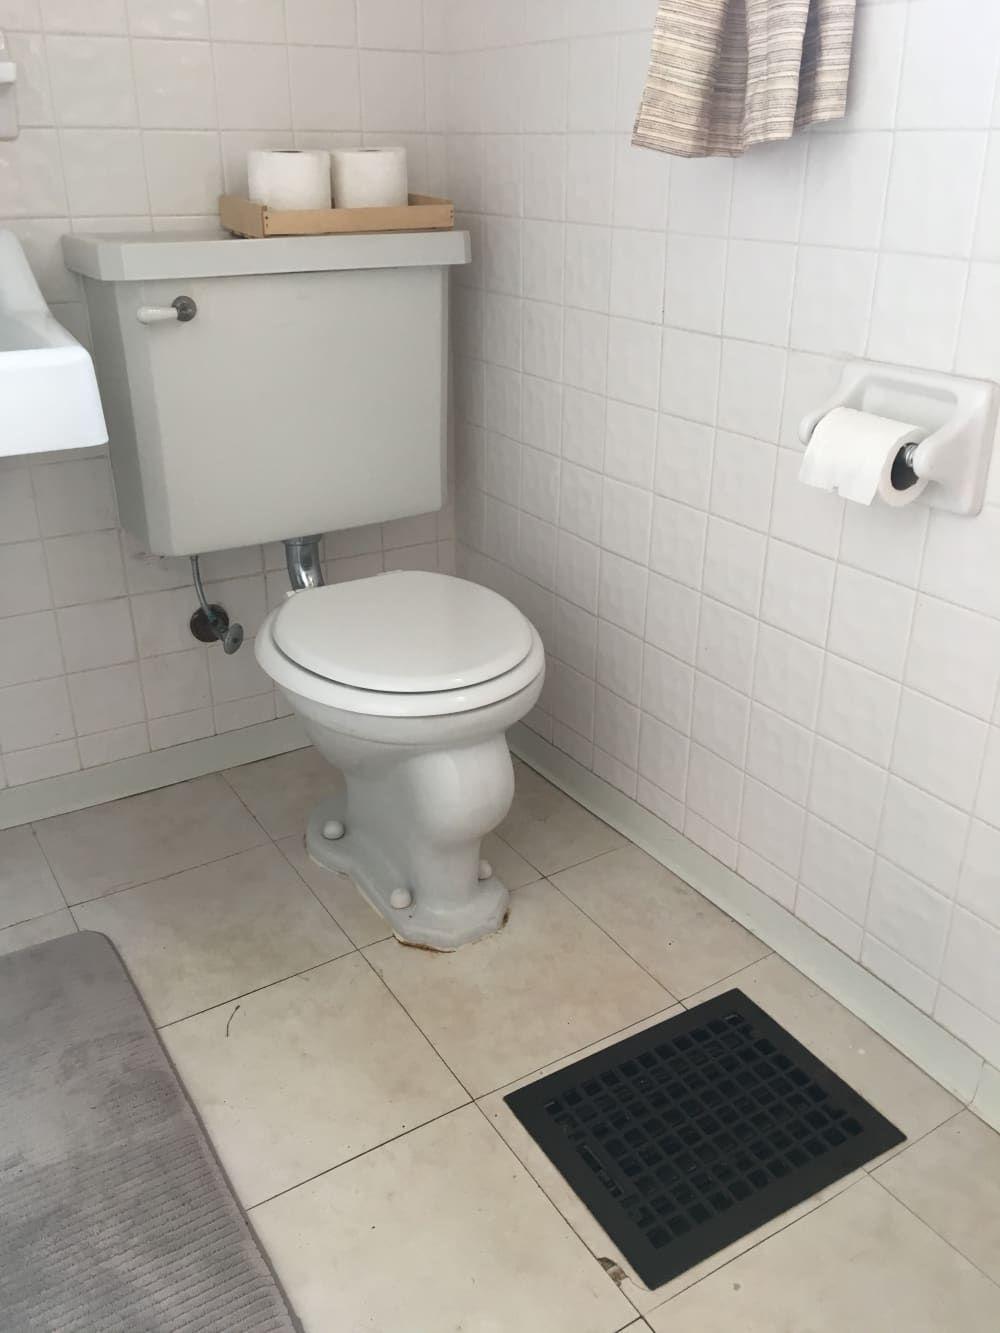 This 50 Temporary Flooring Floats Right Over Rental Bathroom Tile Rental Bathroom Luxury Vinyl Tile Temporary Flooring